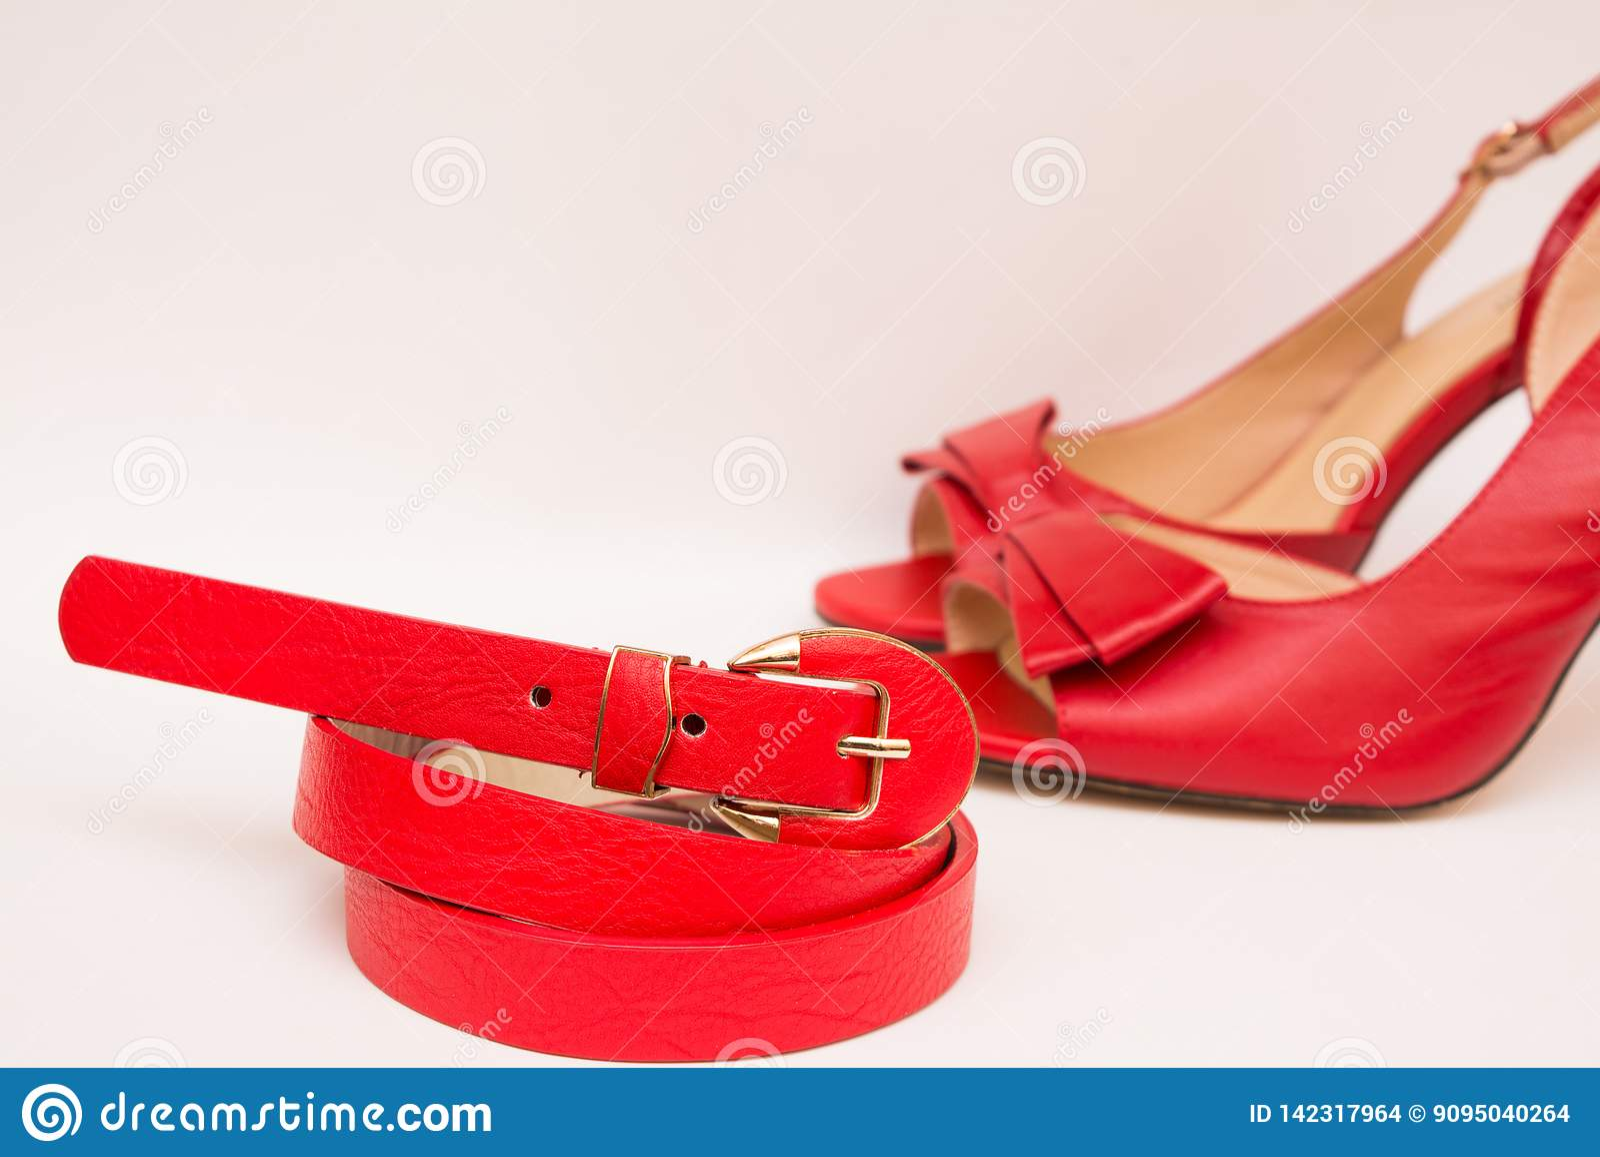 Cinghia di cuoio e scarpe rosse